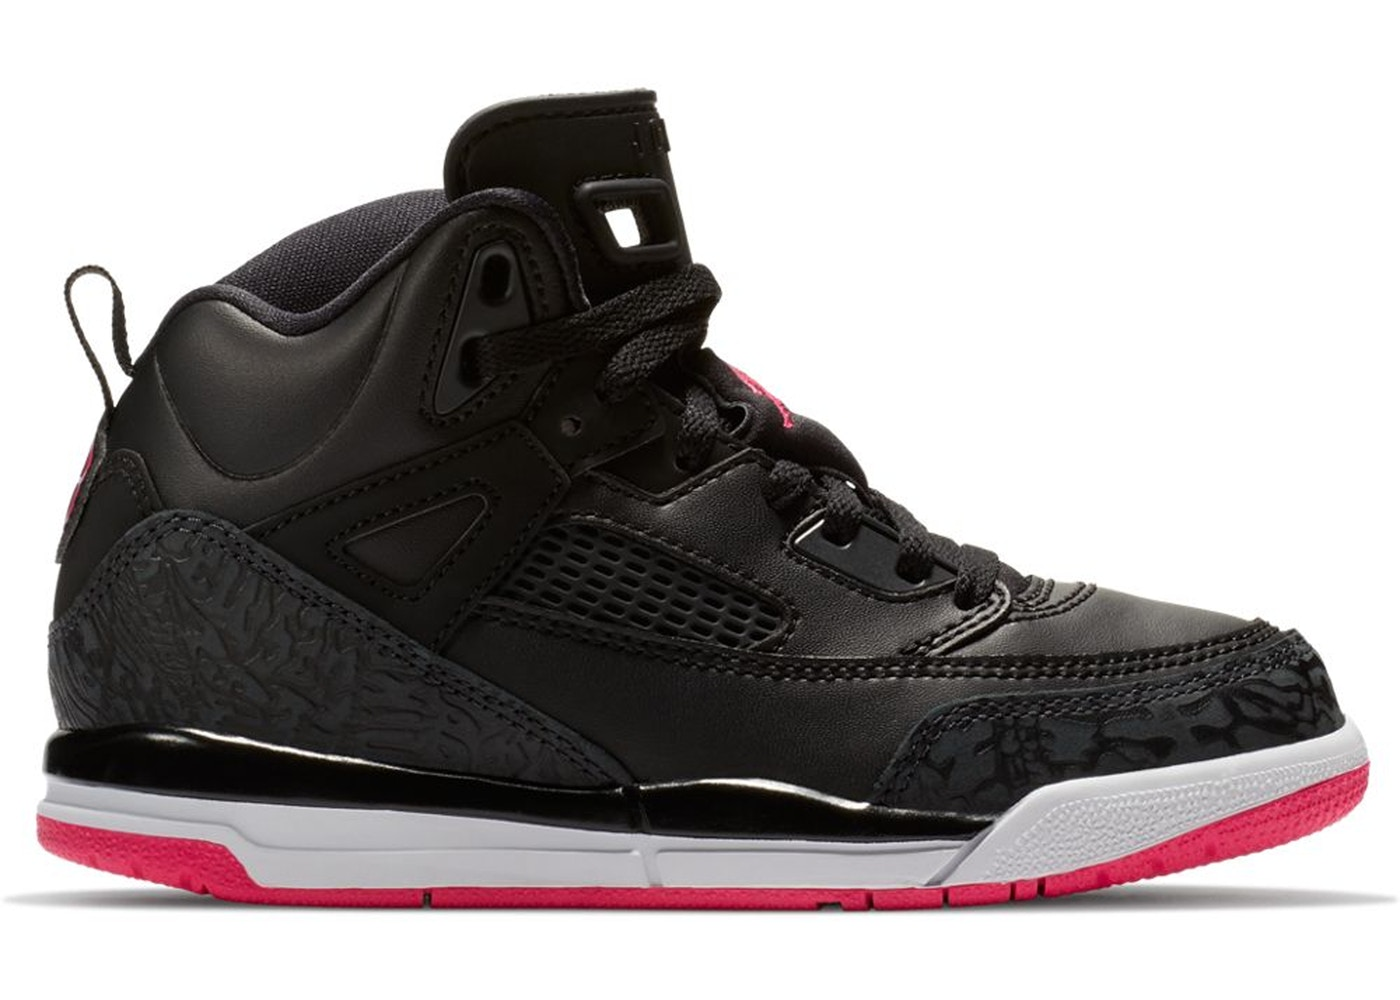 d73020e7b412 Jordan Spizike Black Deadly Pink (PS) - 535708-029